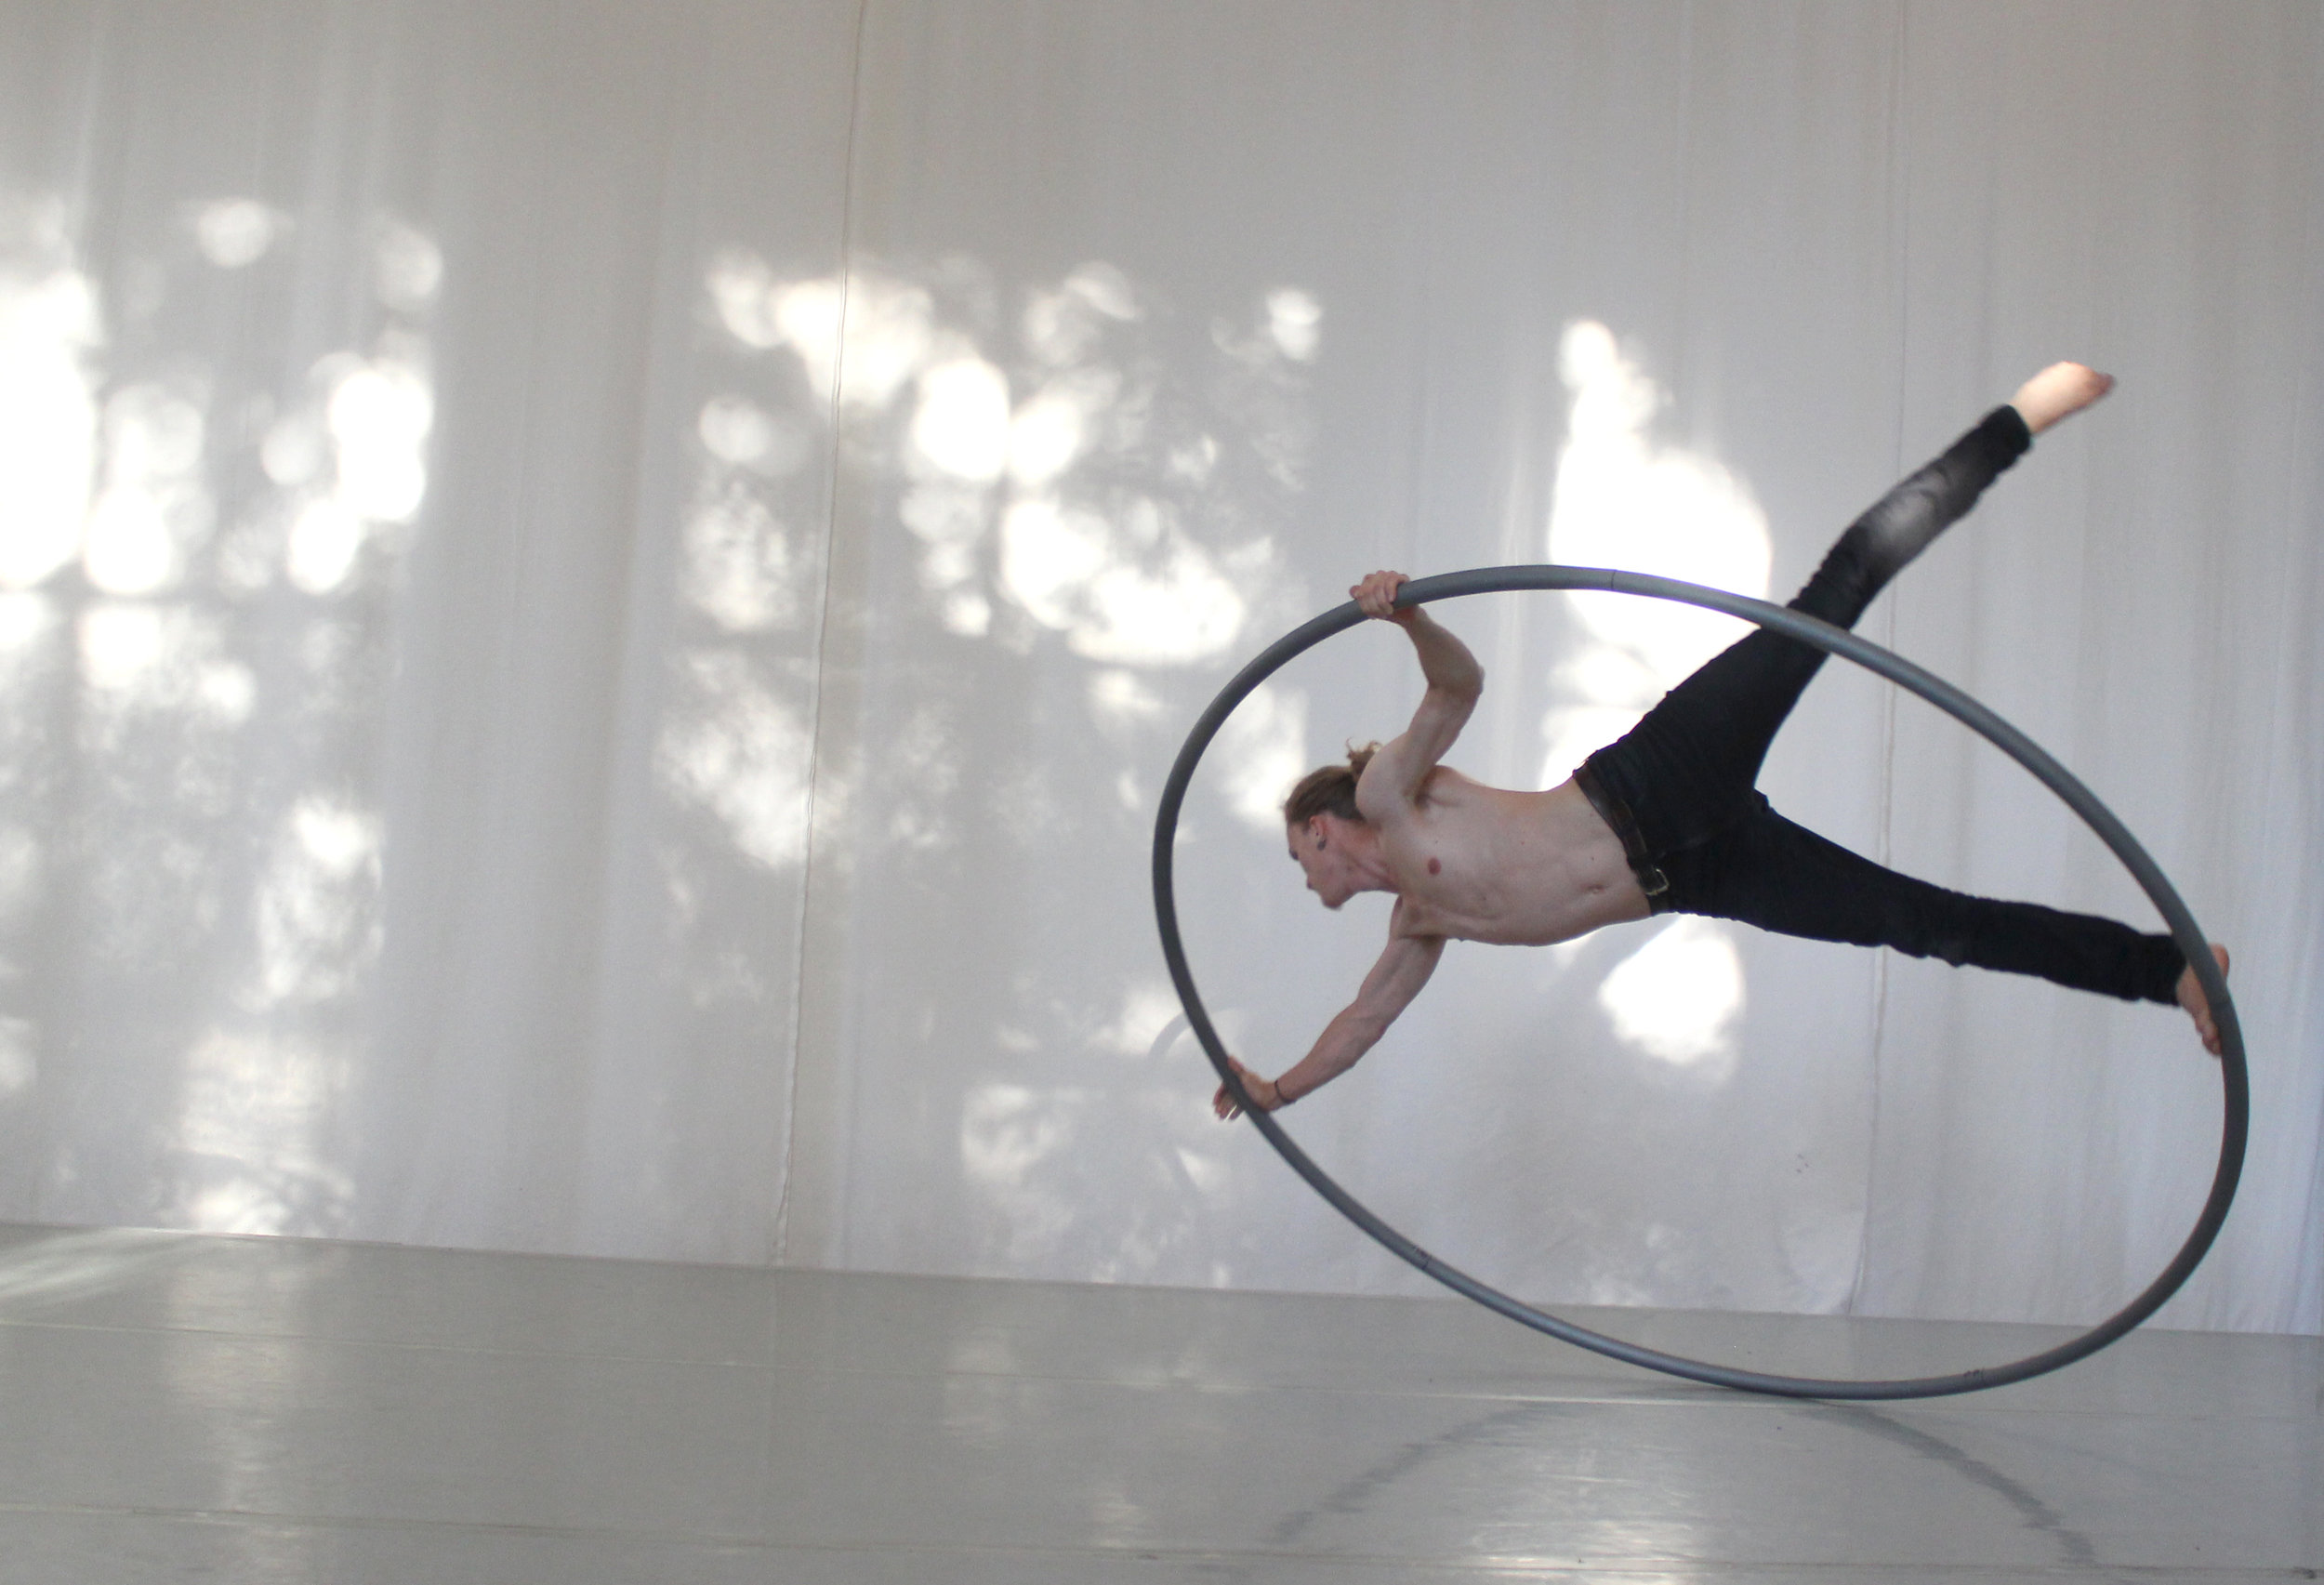 unforgotten_markus-acrobat-4.JPG